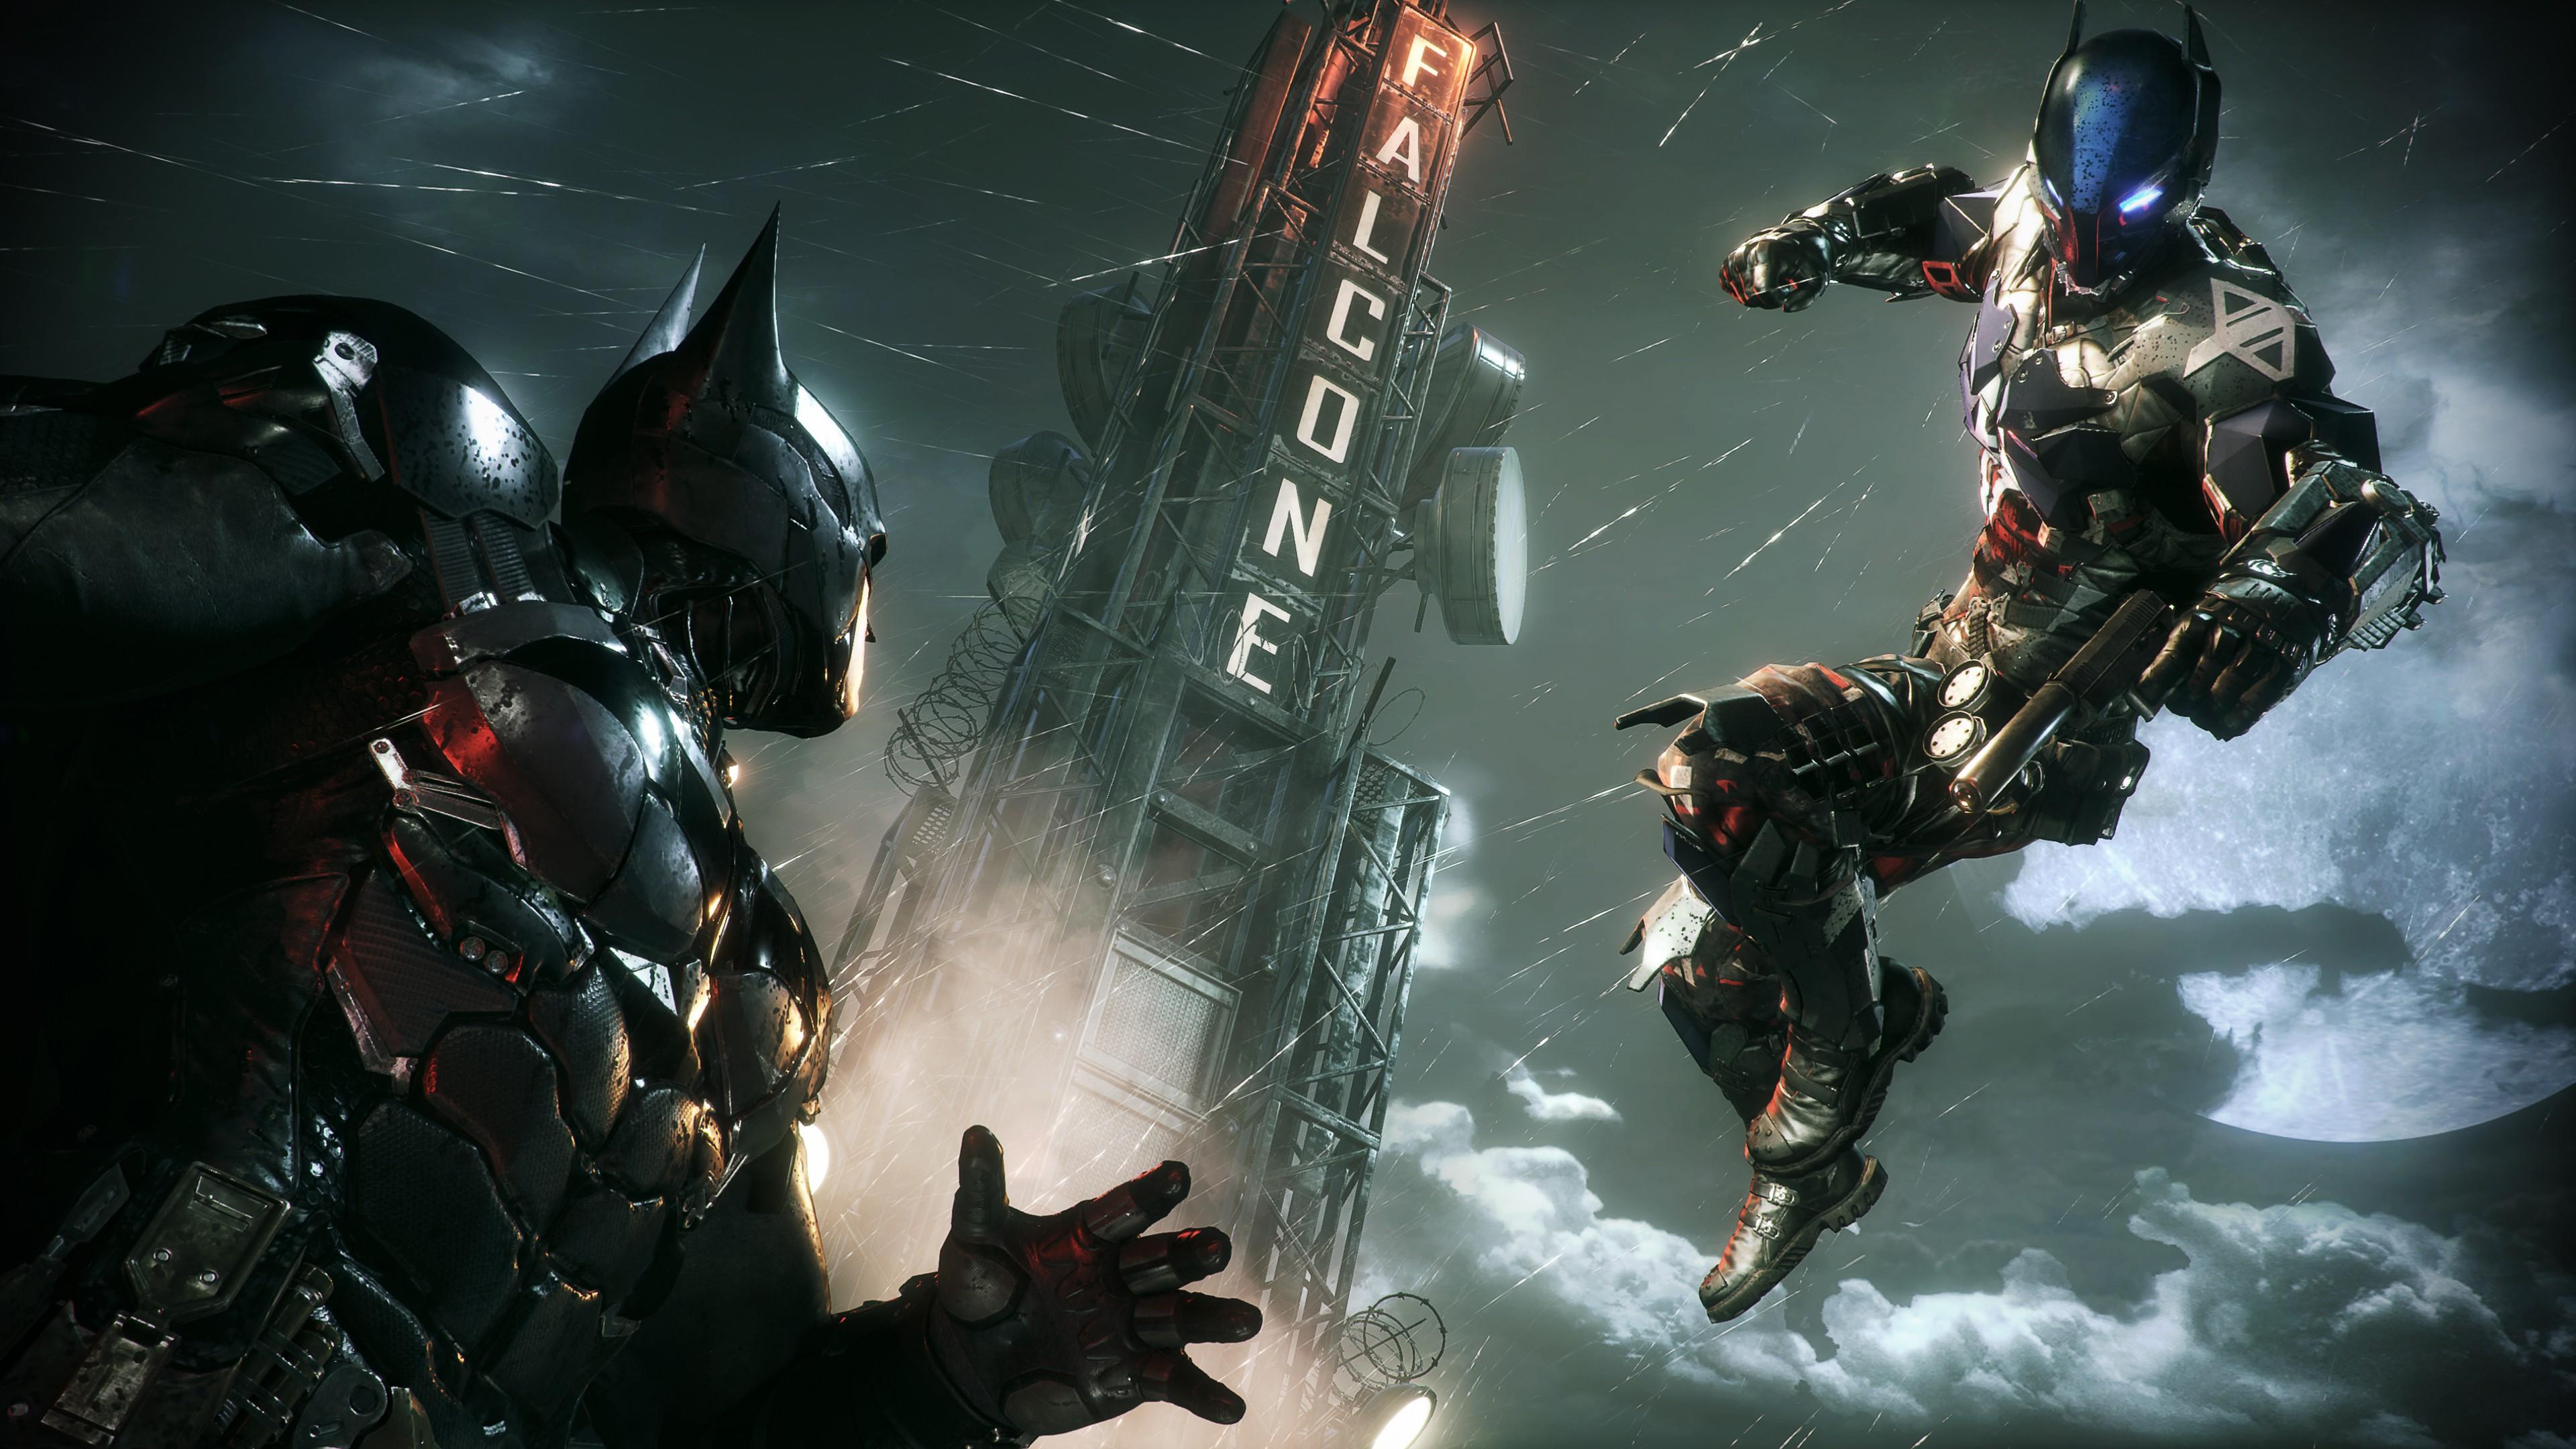 batman arkham knight 4k ultra hd wallpaper background image